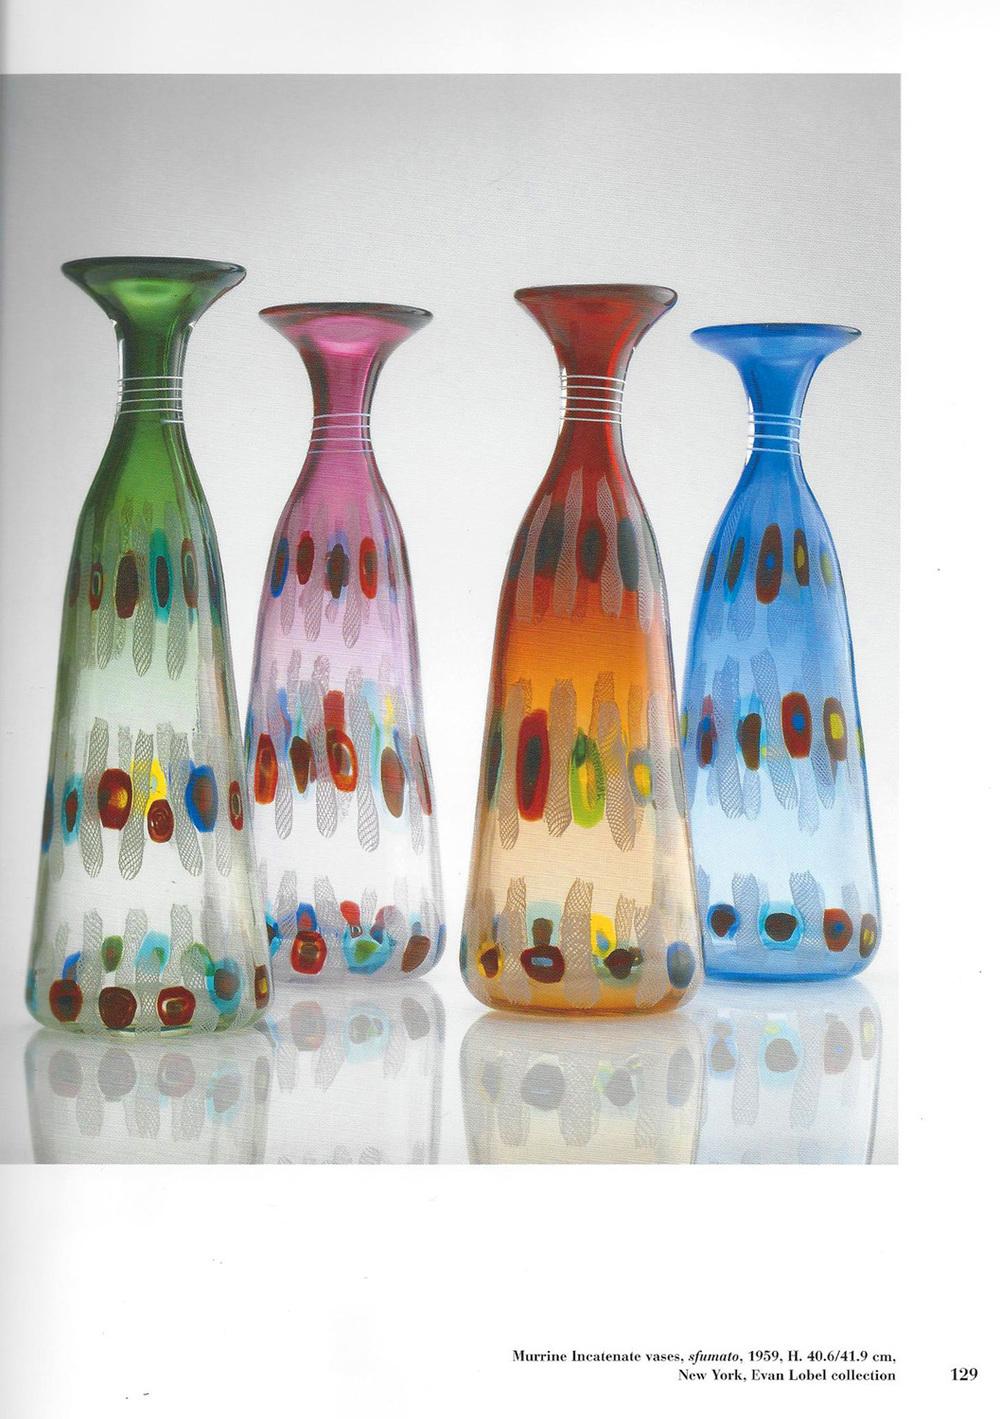 Fuga 85 4 Vases Murrine Incatenate 4x fuga60 detail7 hires.jpg